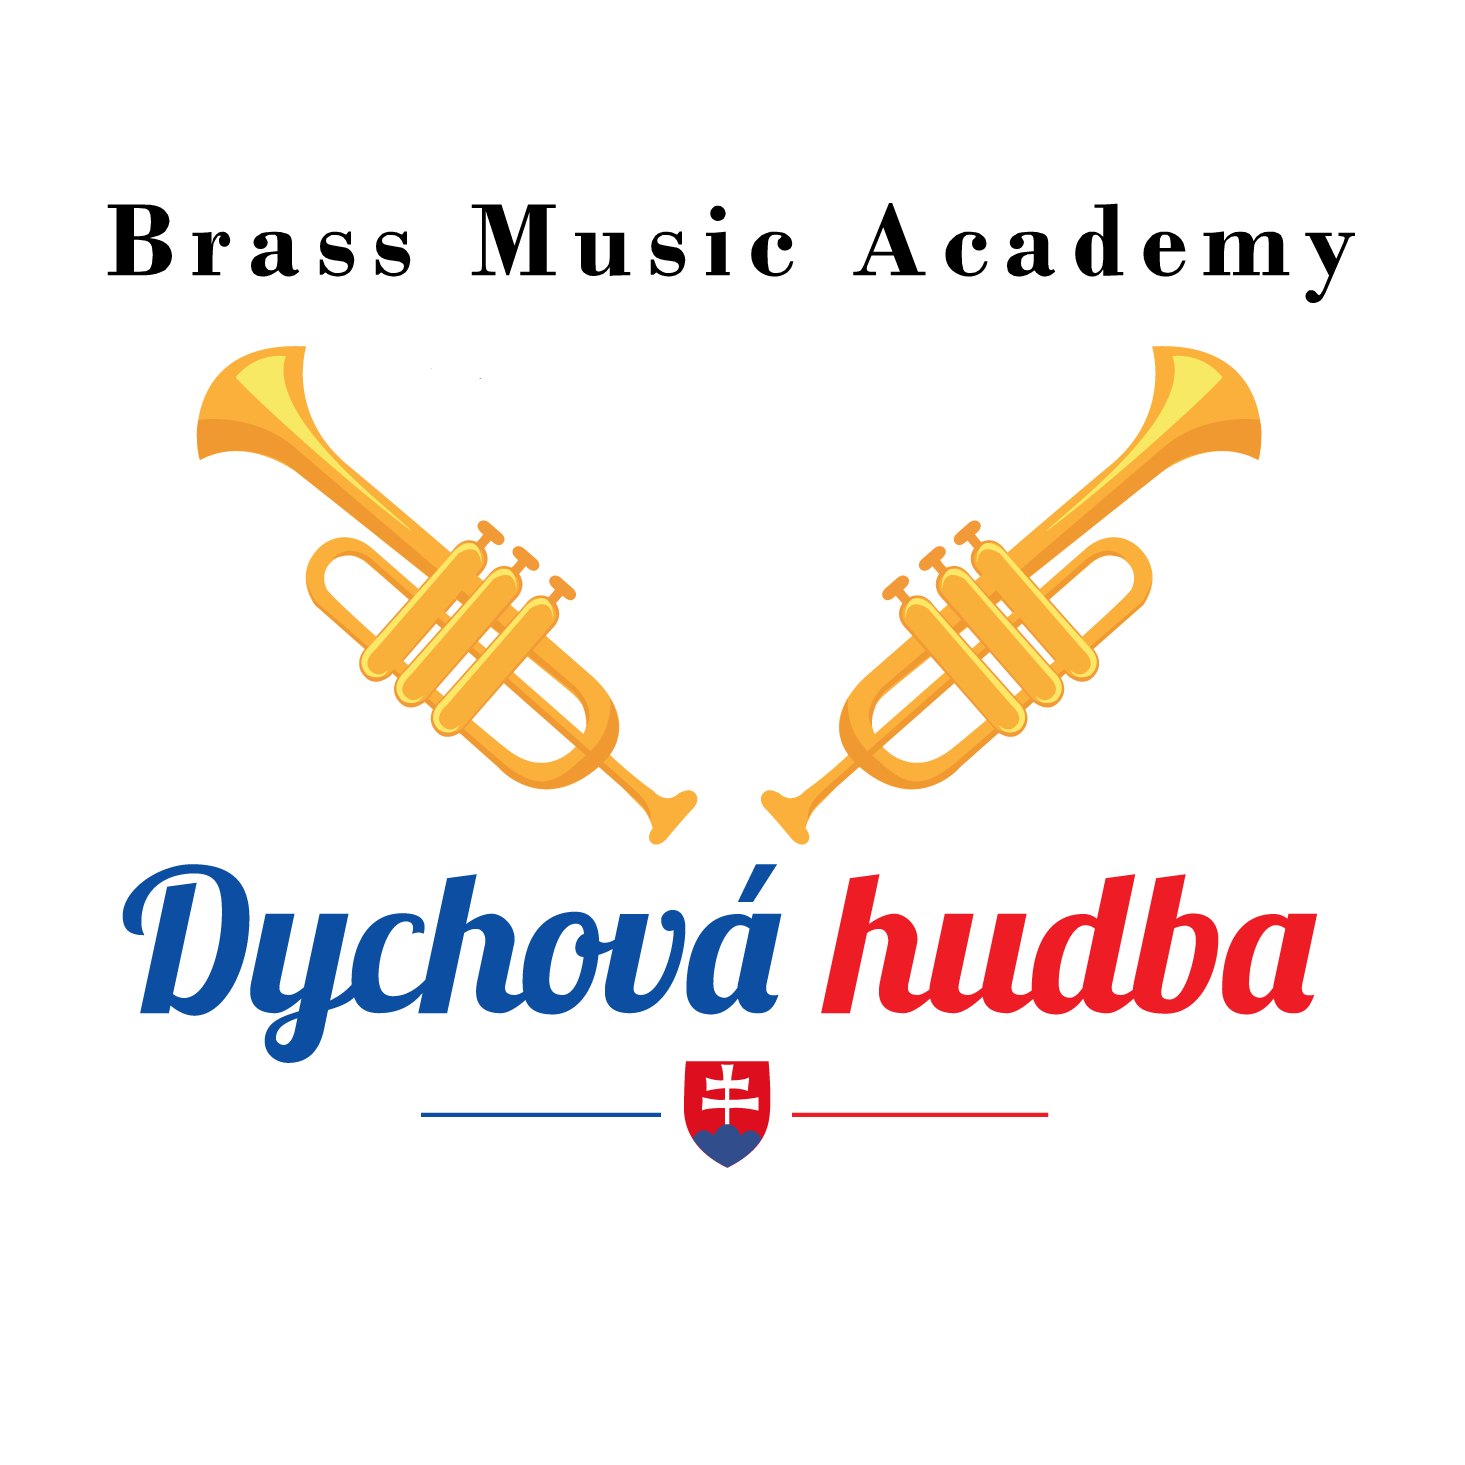 BMA - Brass Music Academy